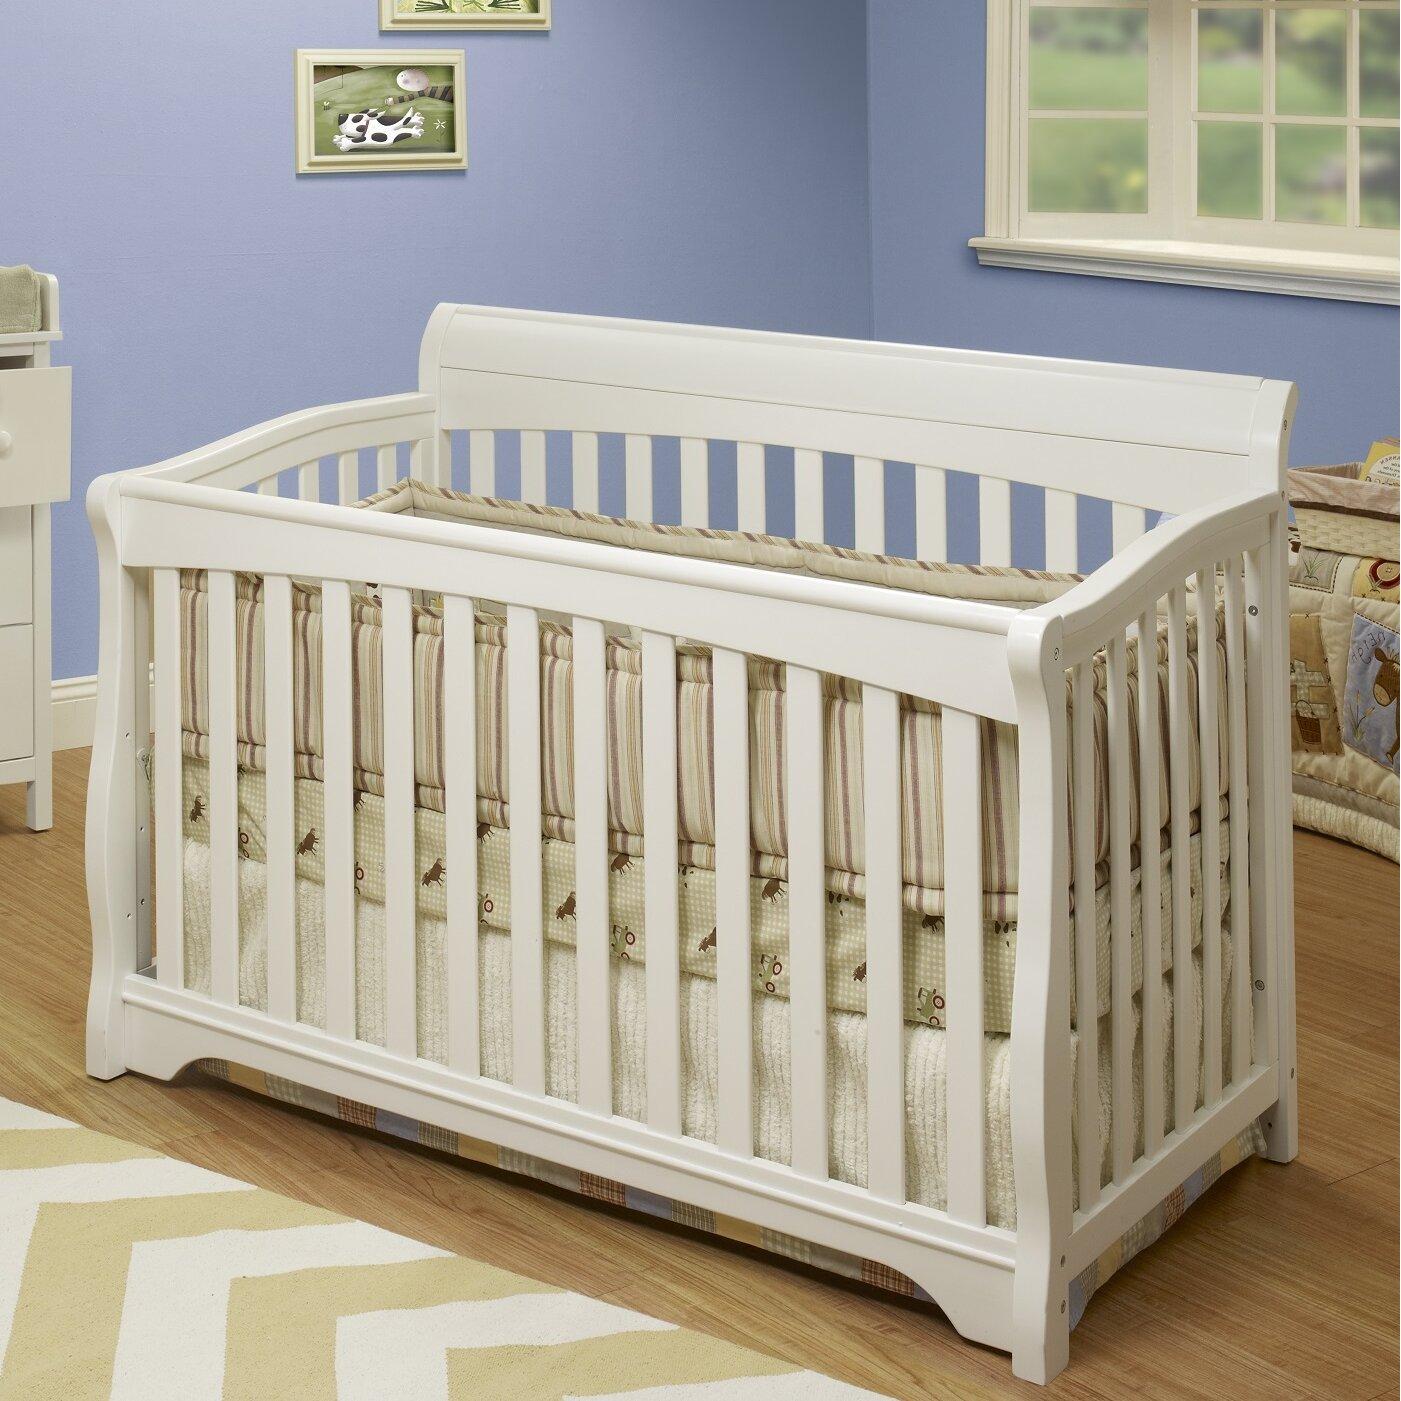 Graco Freeport Convertible Crib Graco Hayden 4in1